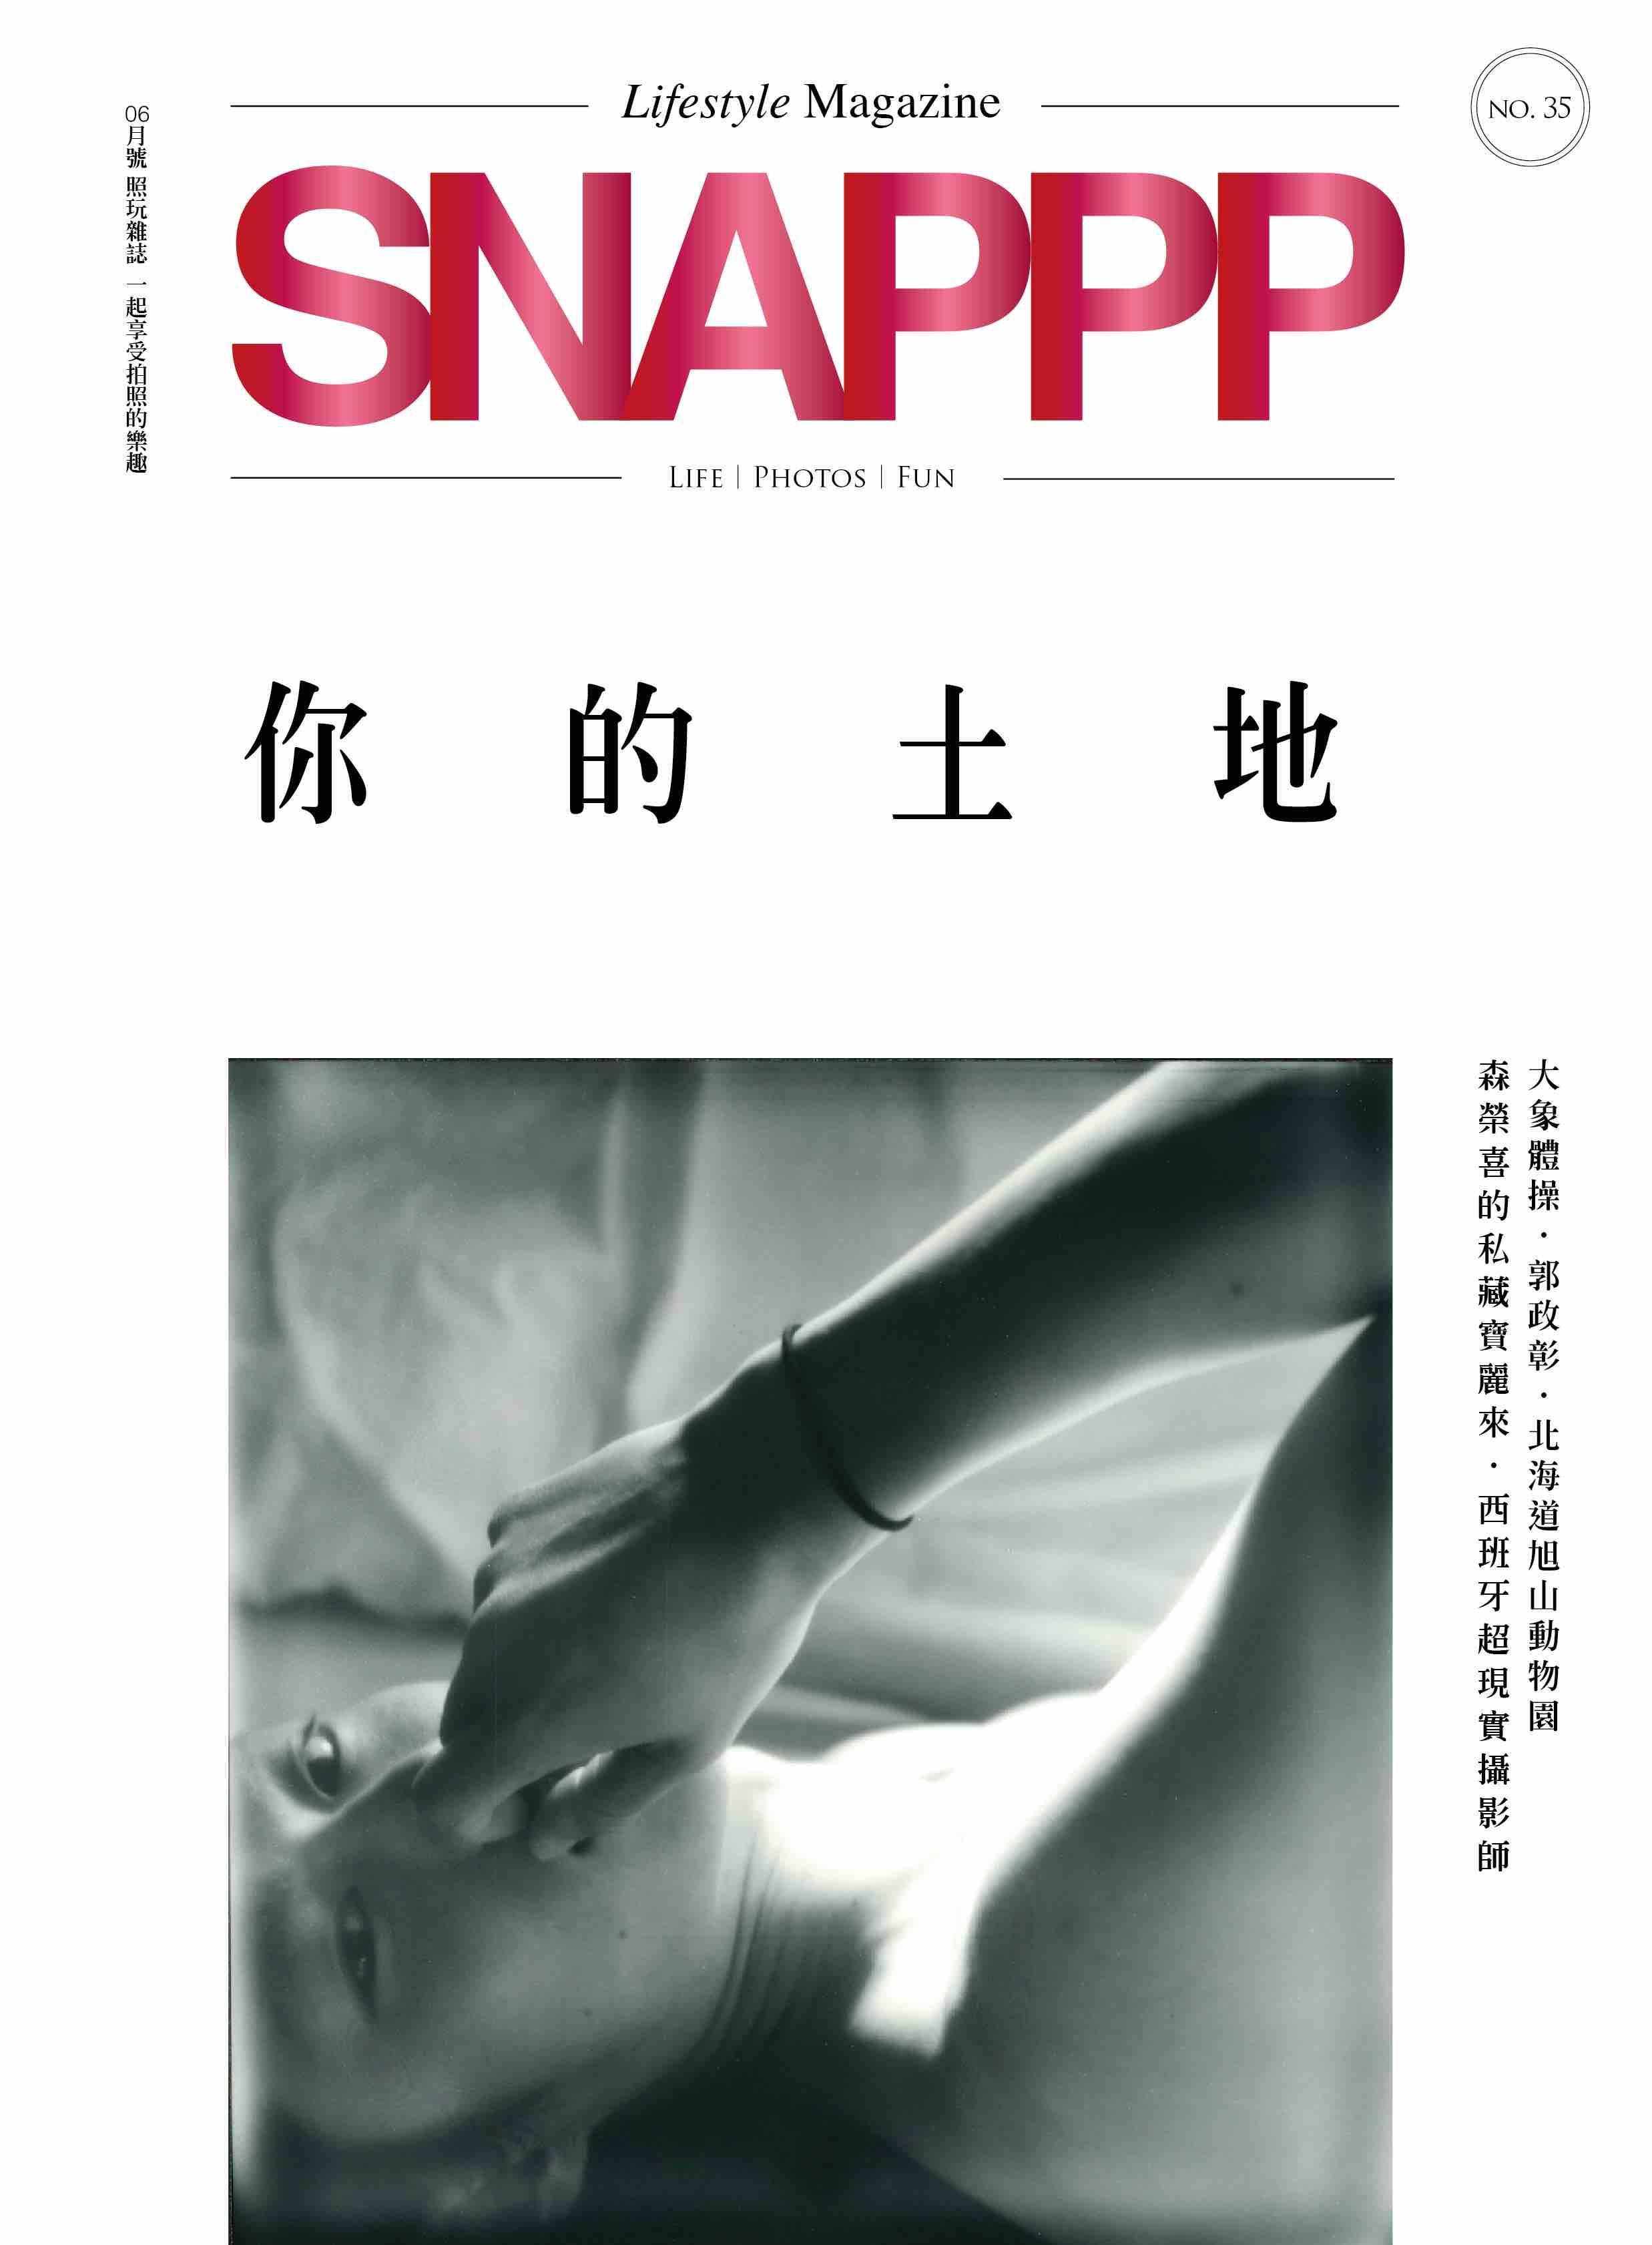 SNAPPP-NO35 COVER-ver1.jpg